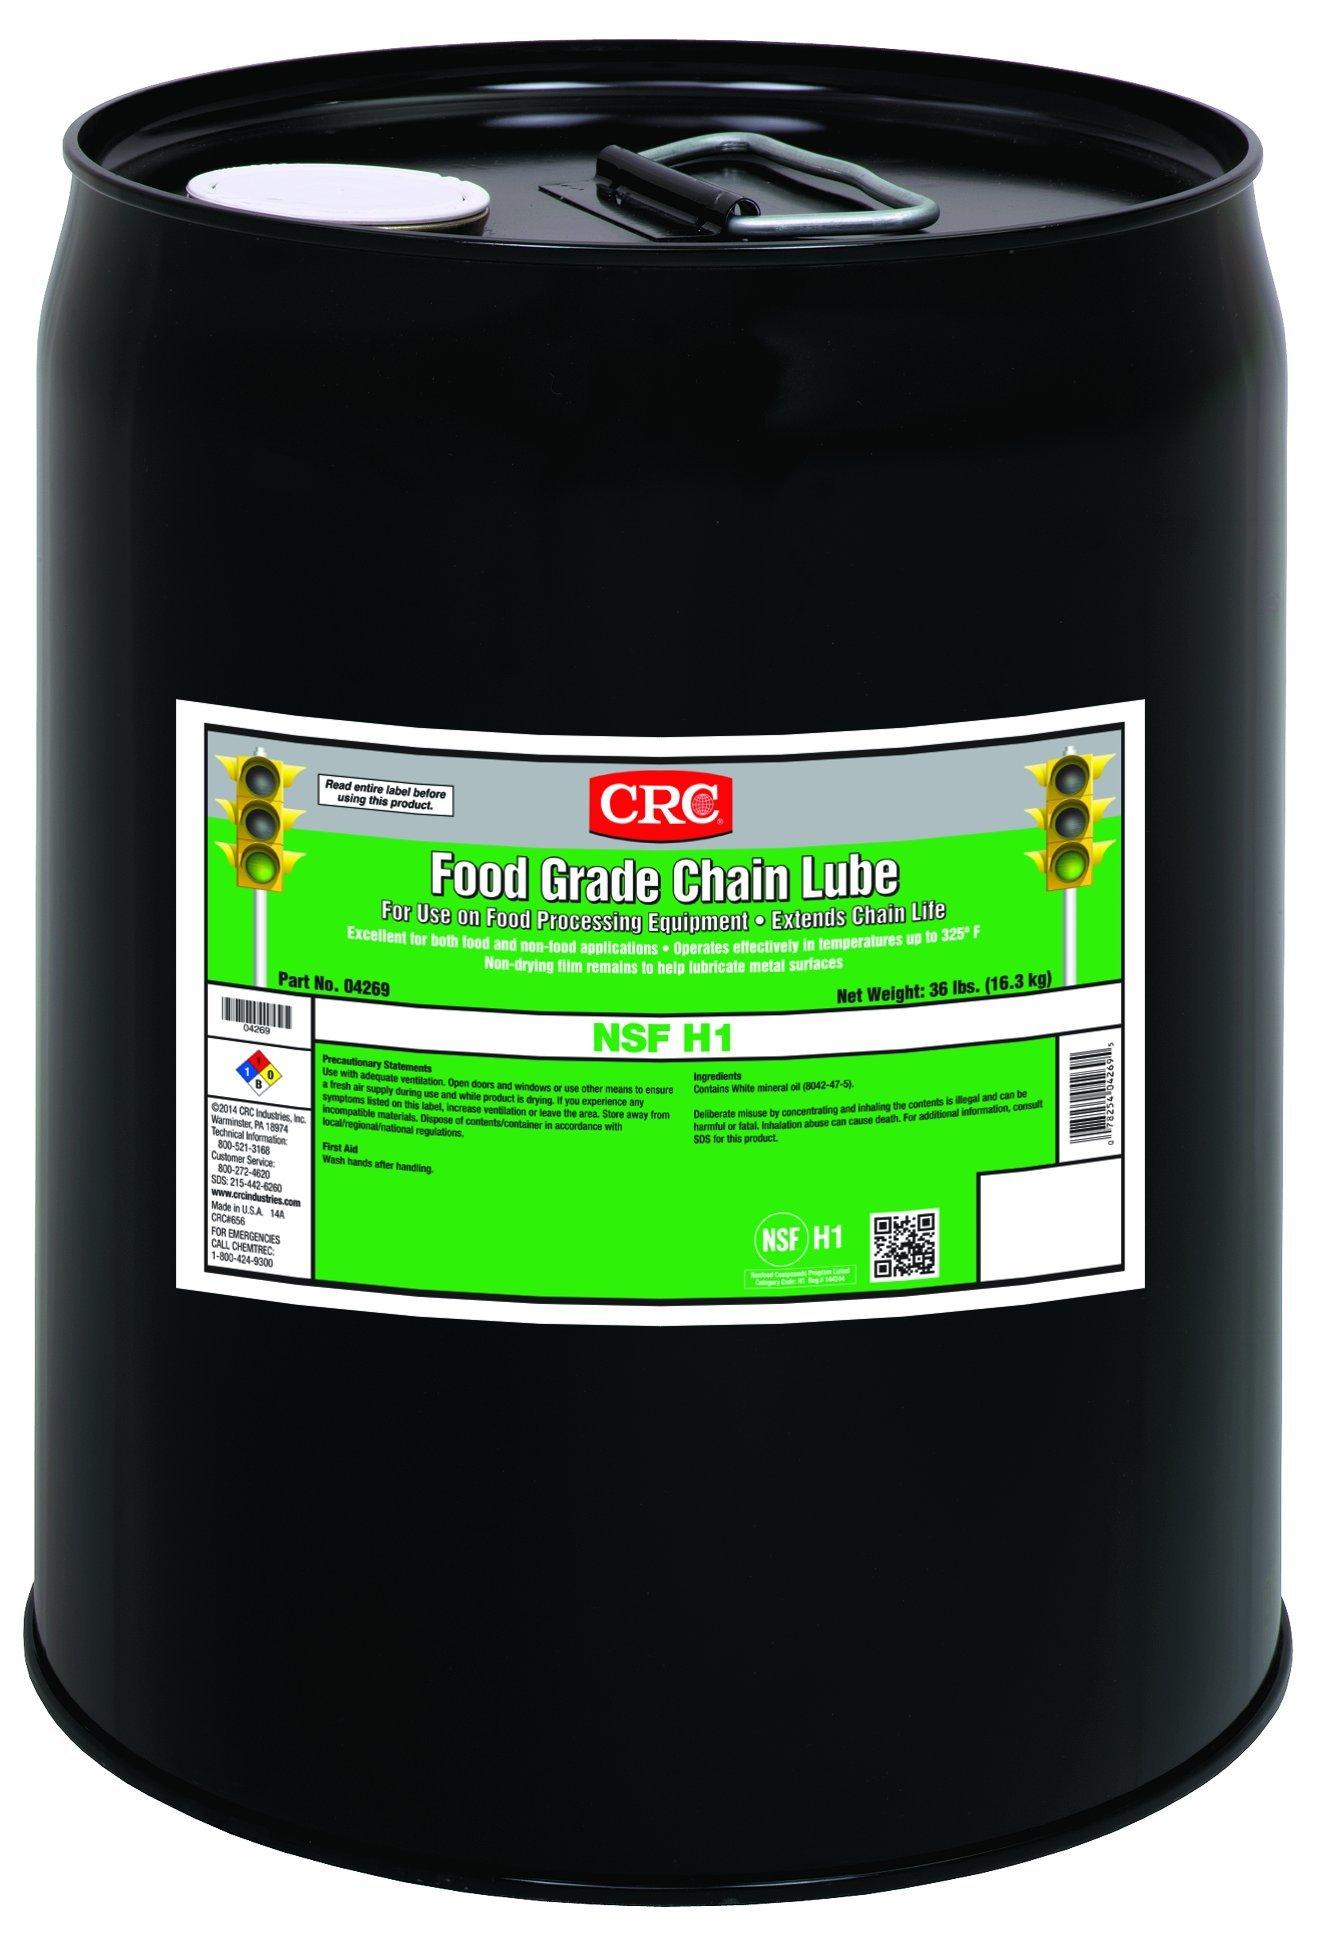 CRC Food Grade Chain Lubricant, 5 Gallon Pail, Clear/White